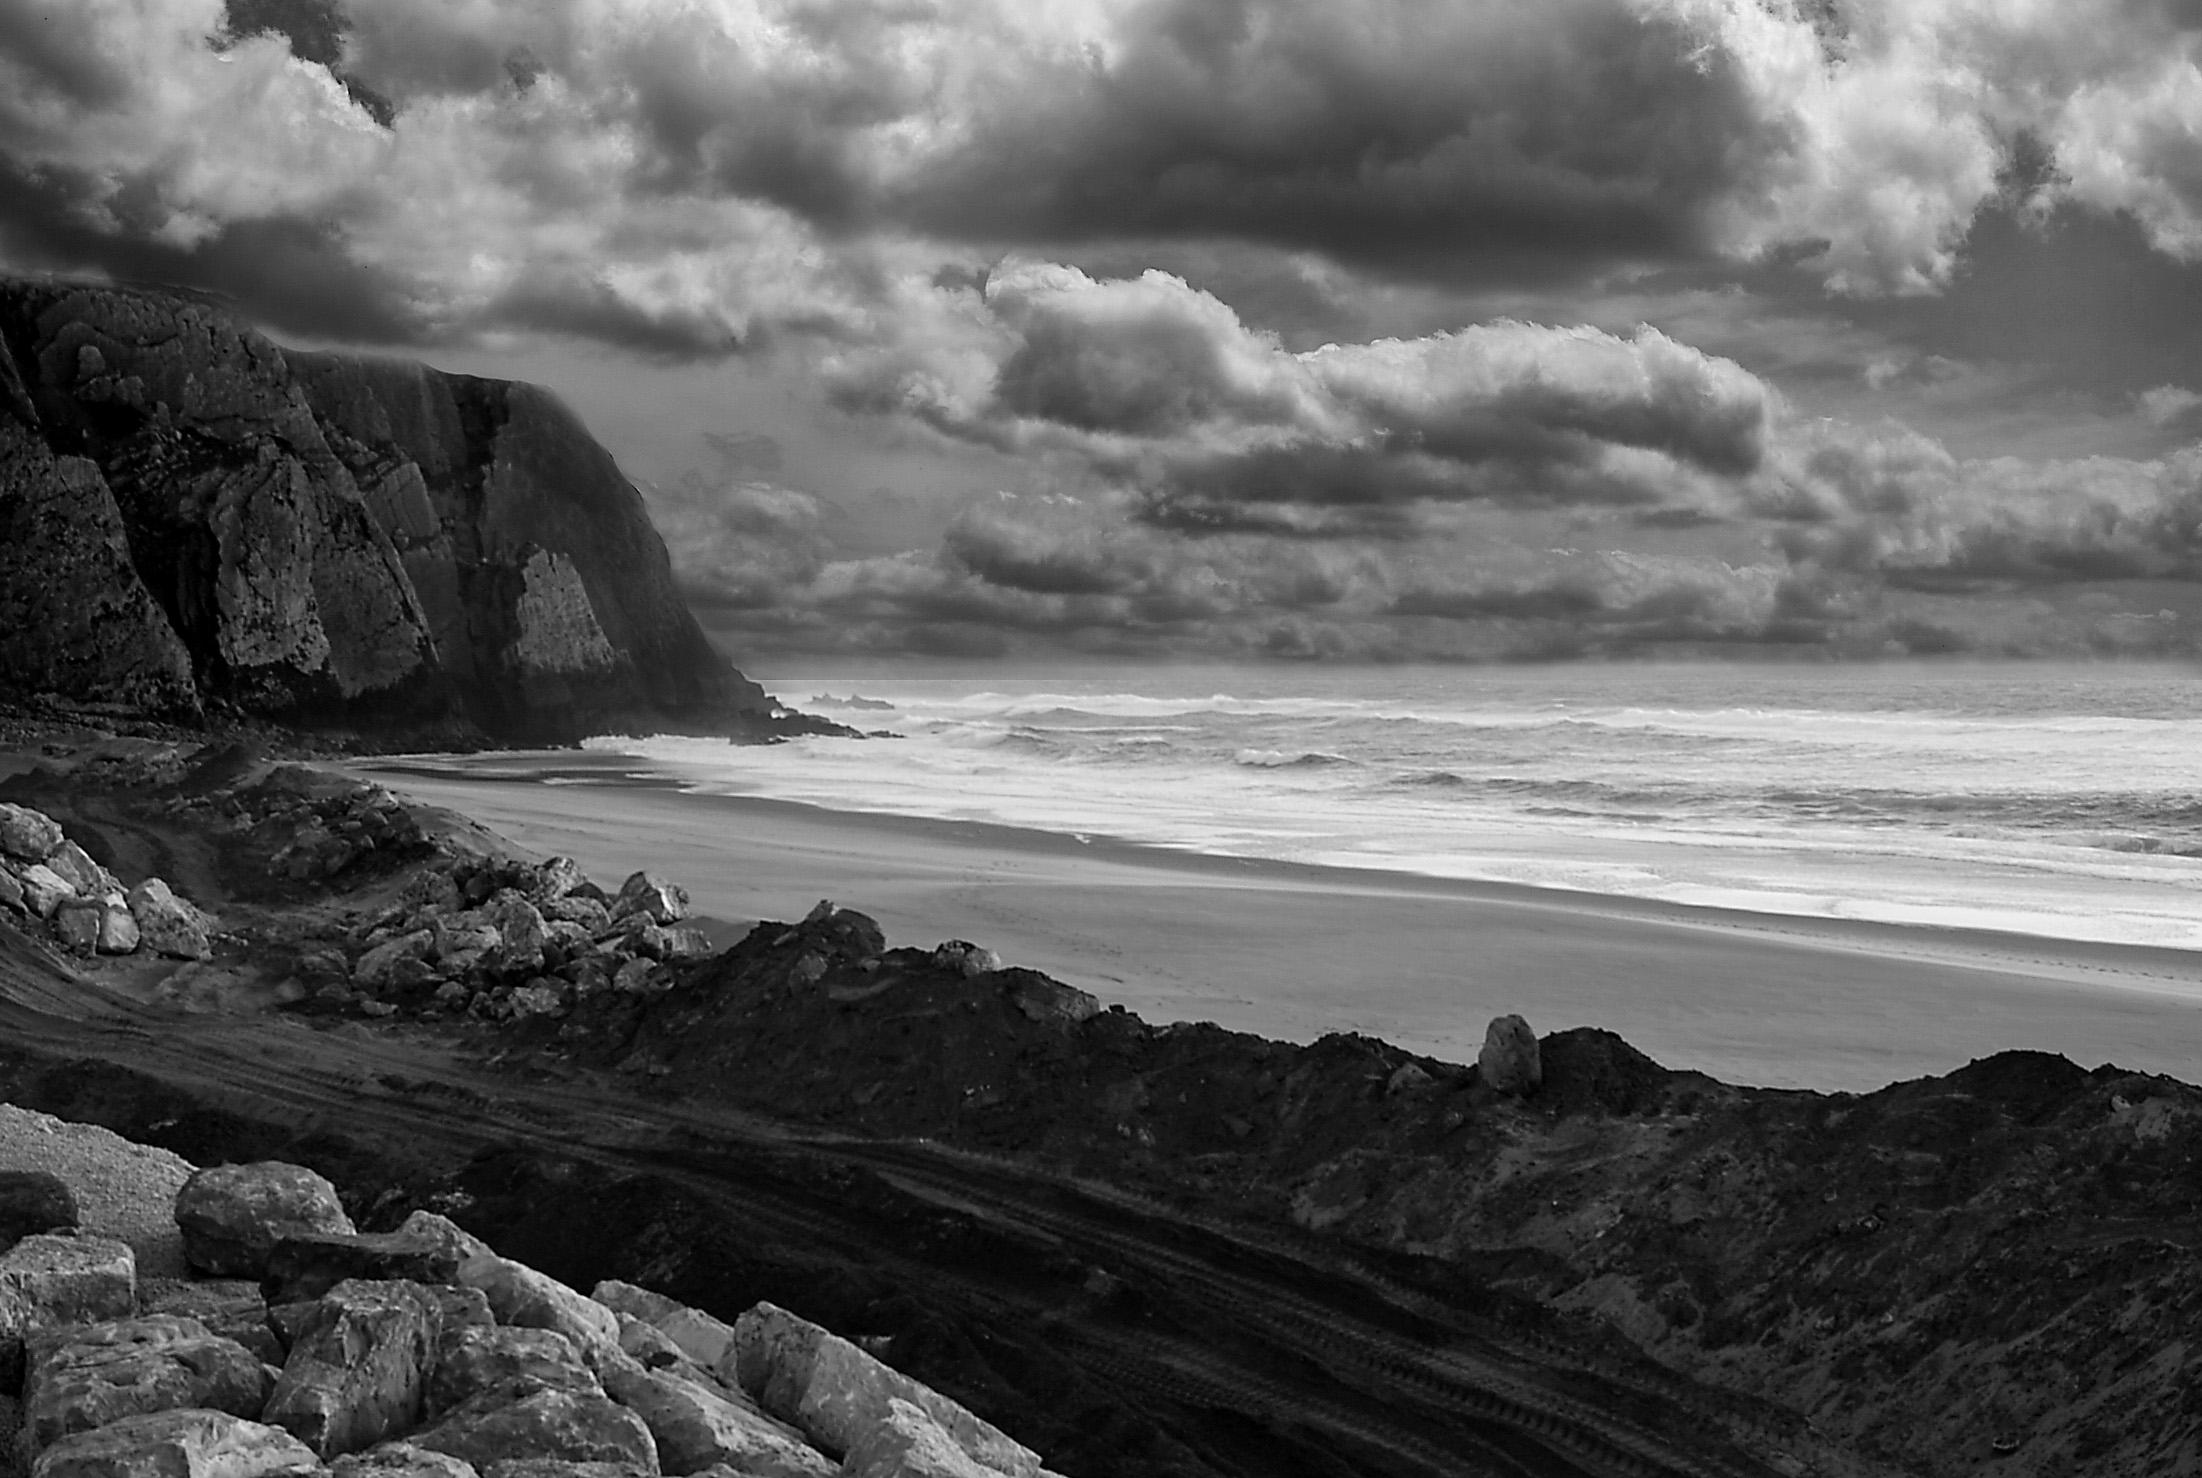 © Rodrigo Cabral Praia Grande 2016